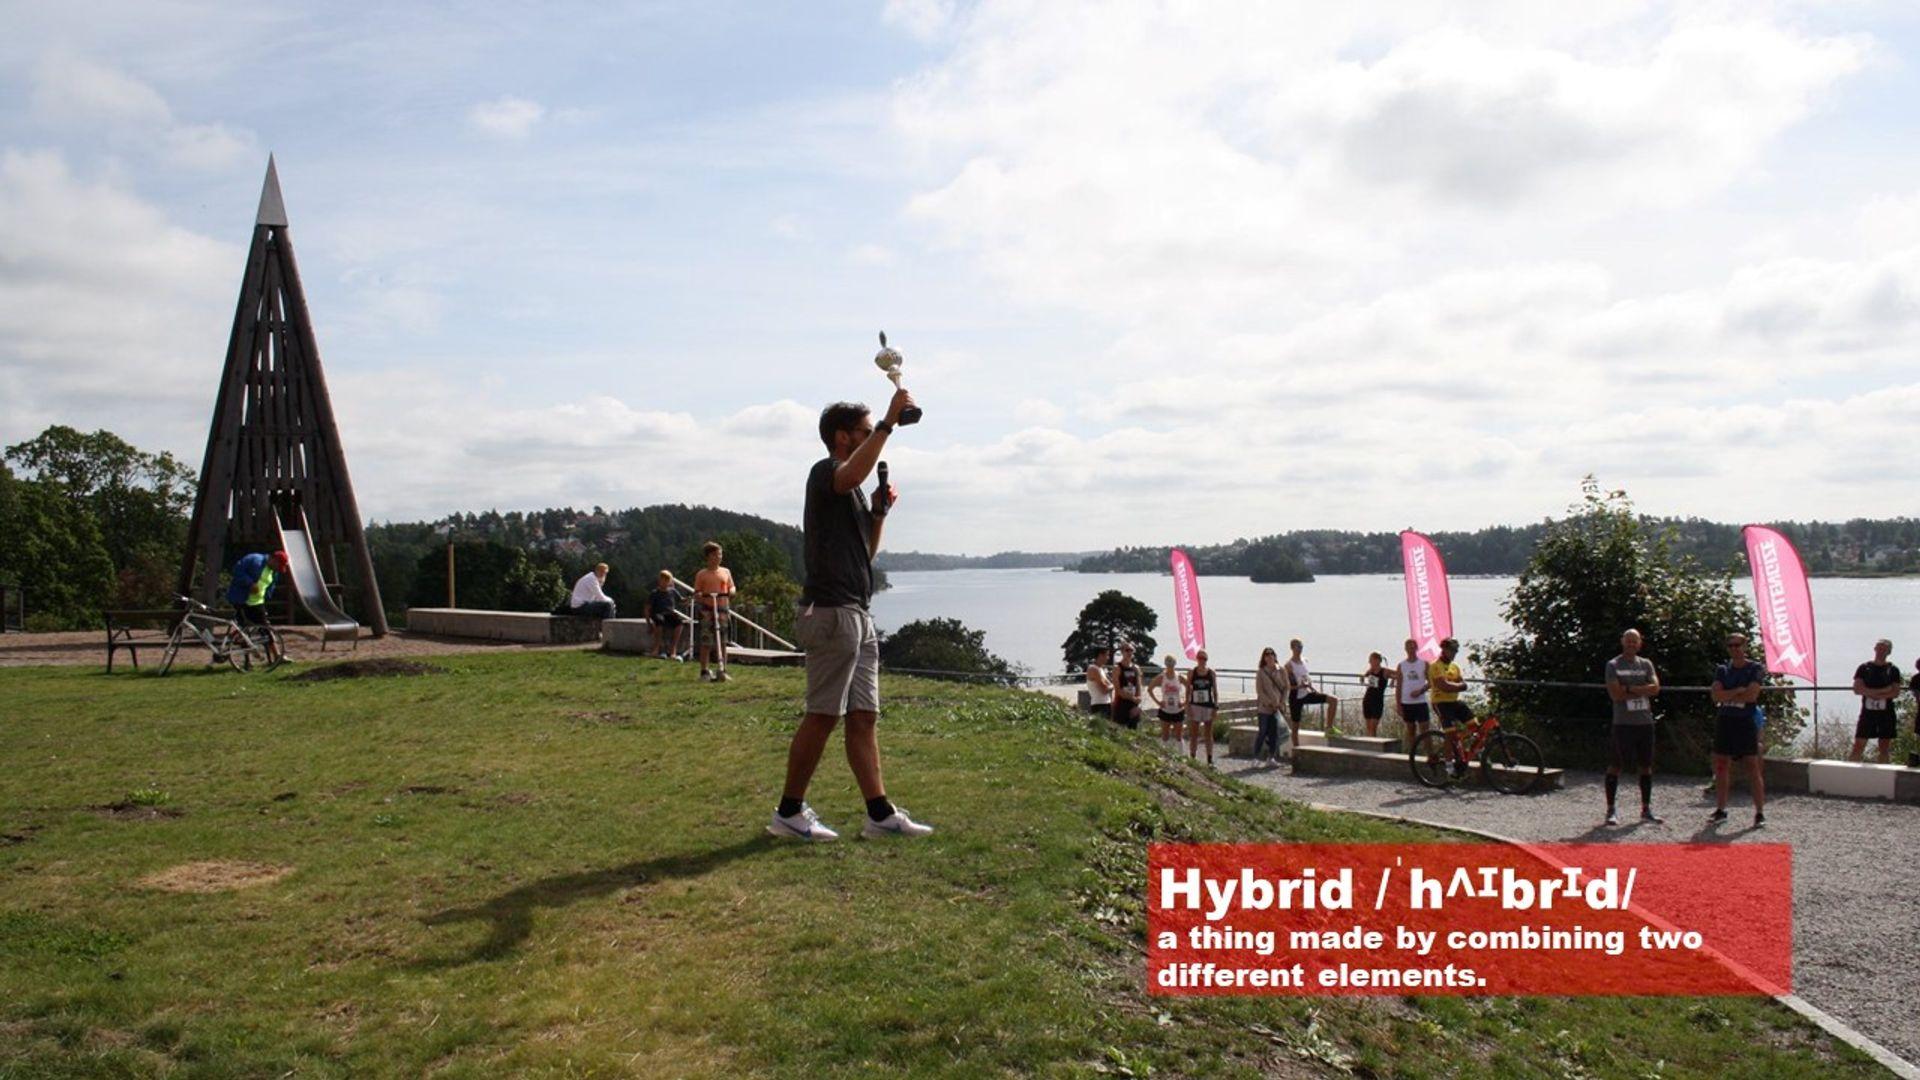 Summer 21km - Hybrid - SOLO